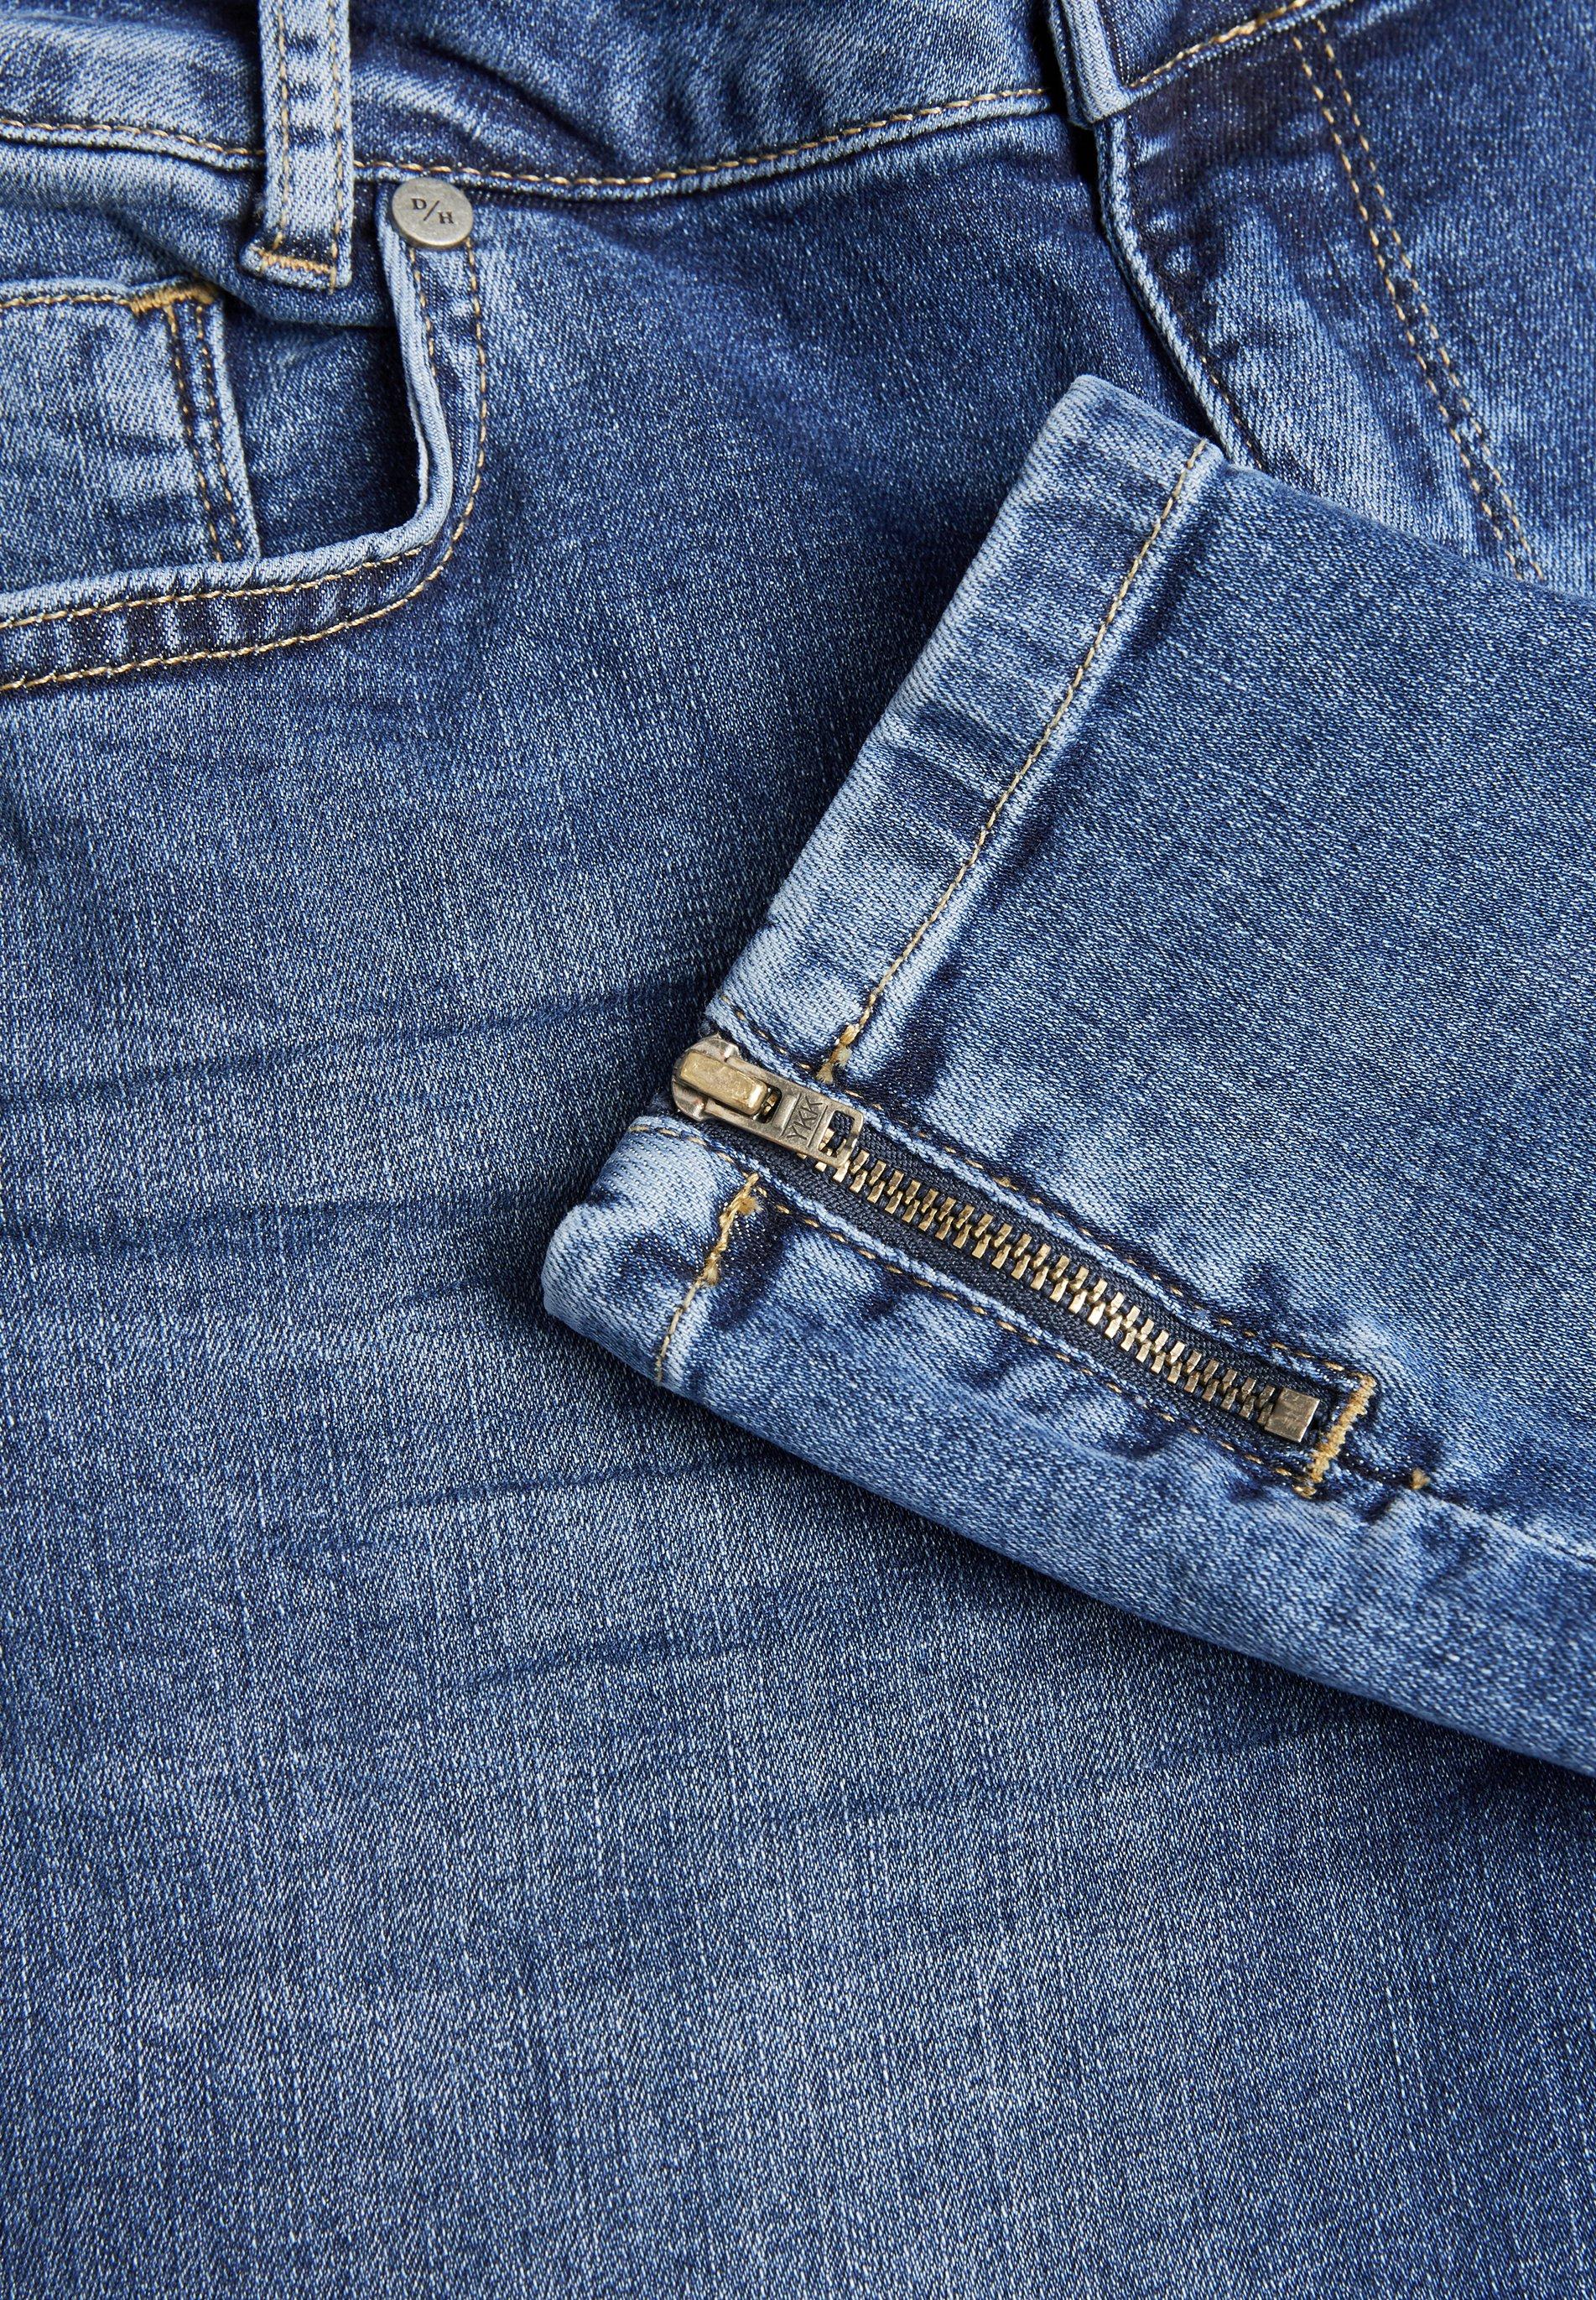 Denim Hunter 37 The Cillezip High Custom - Jeans Slim Fit Medium Blue Wash